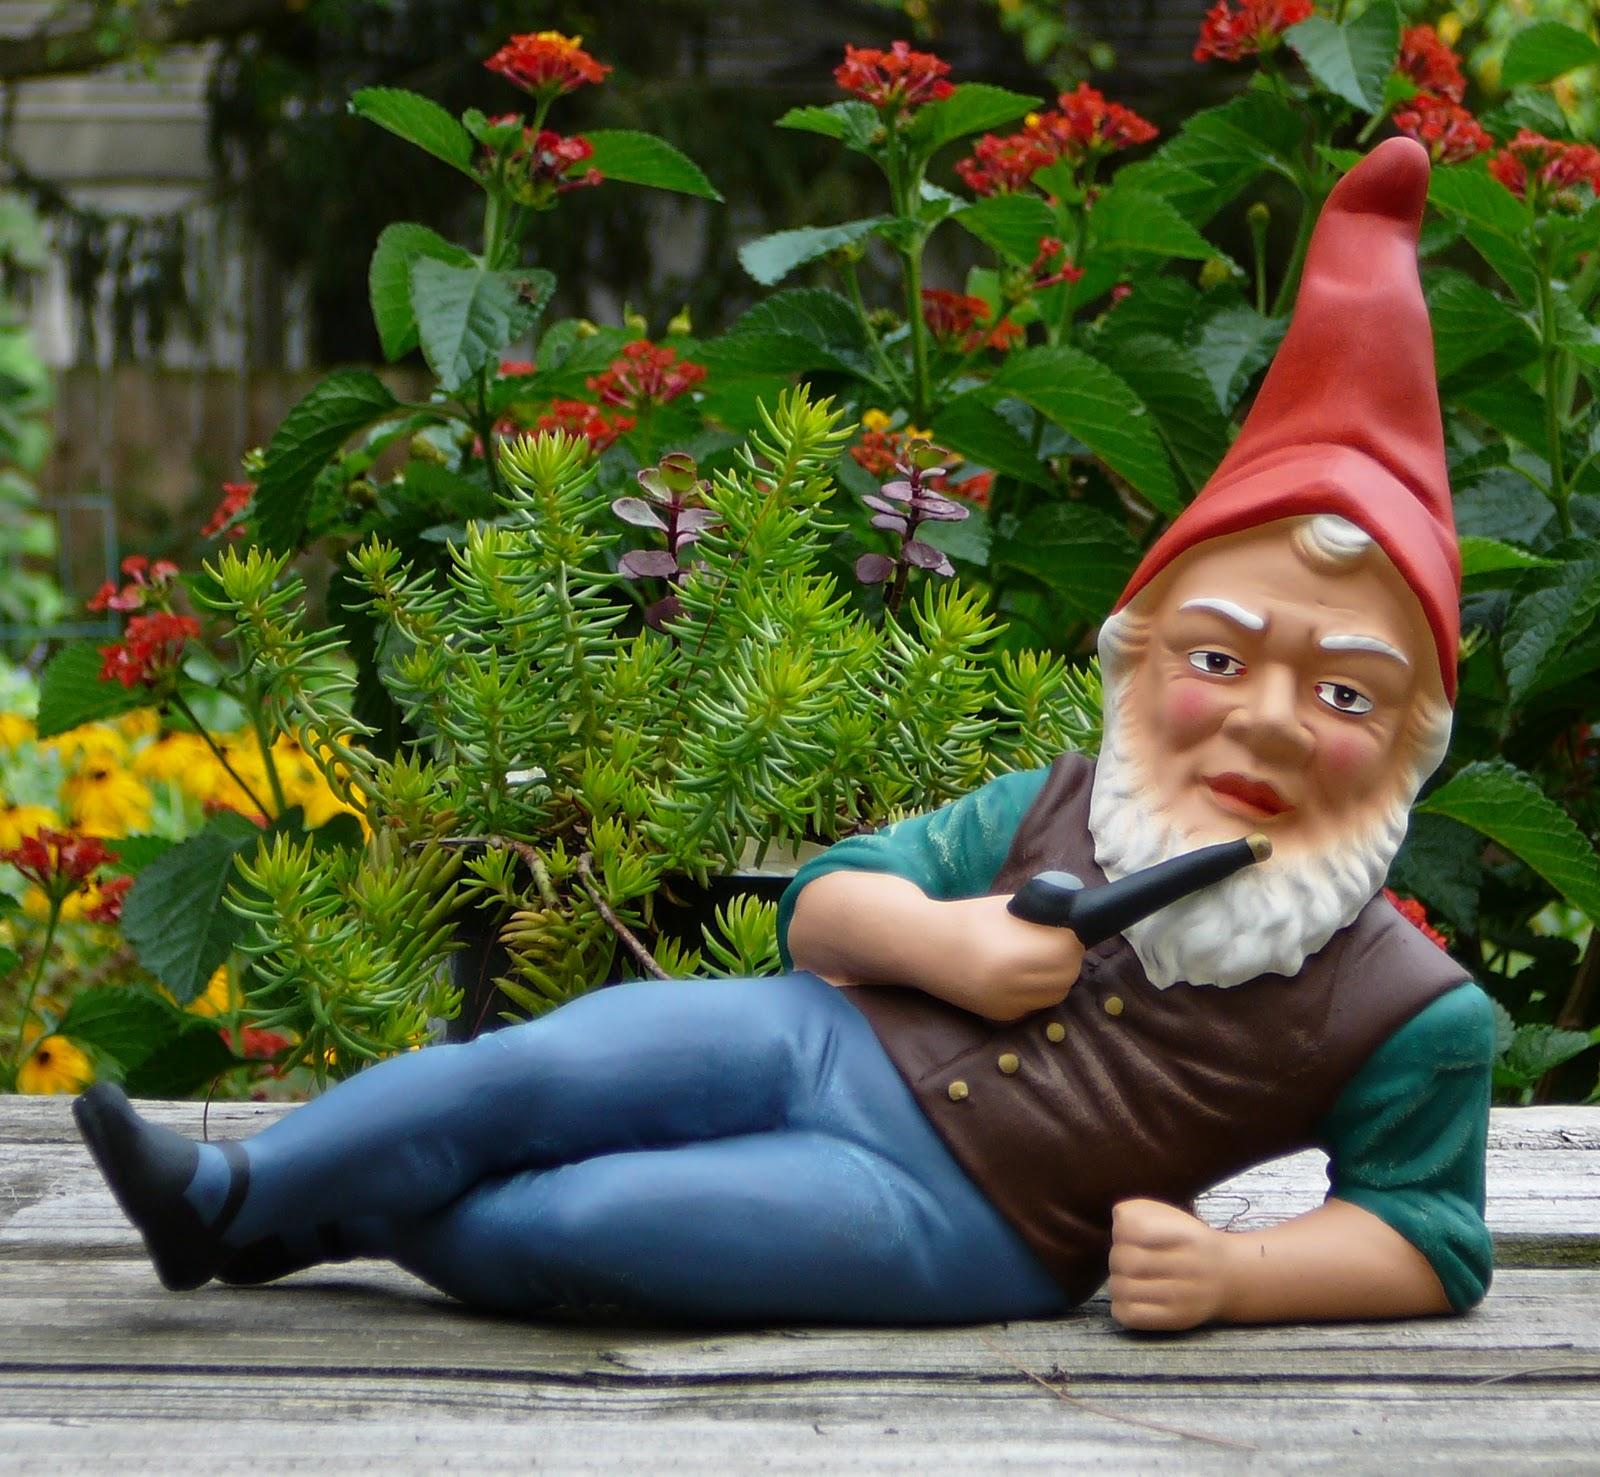 Gnome 4: Ecole Puntledge Park School Garden